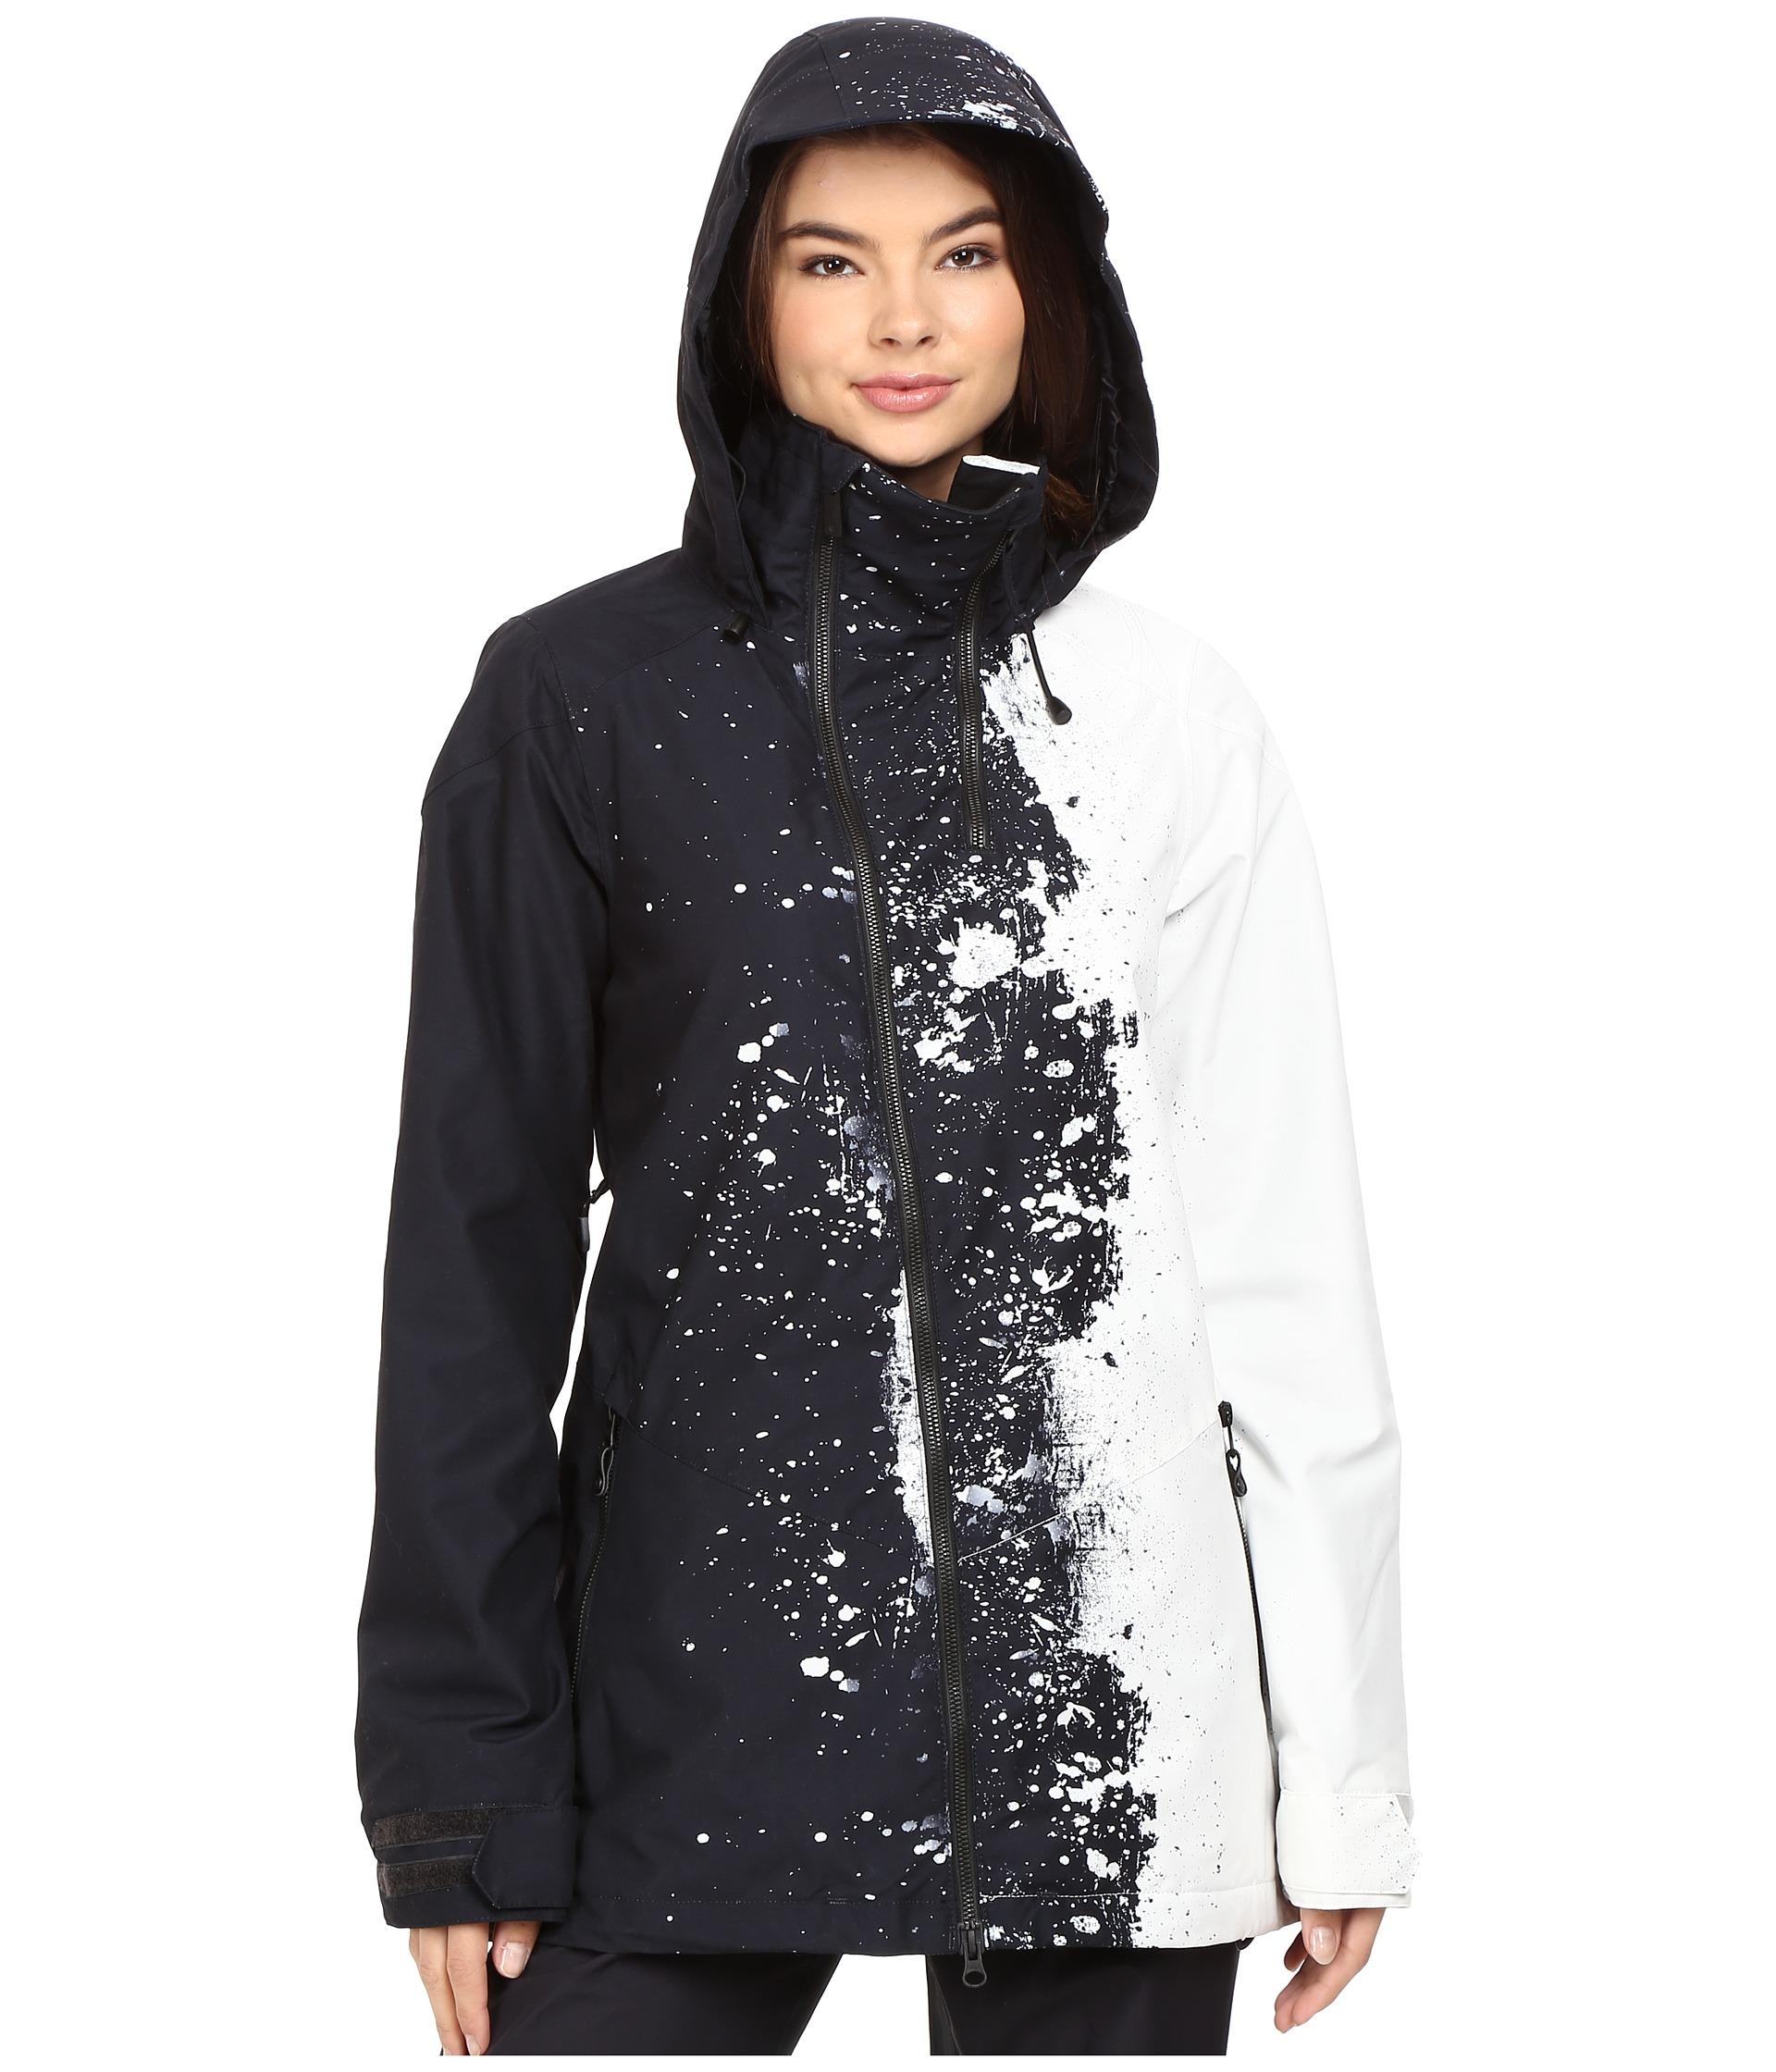 Volcom Snow Bristol Jacket Black White Zappos